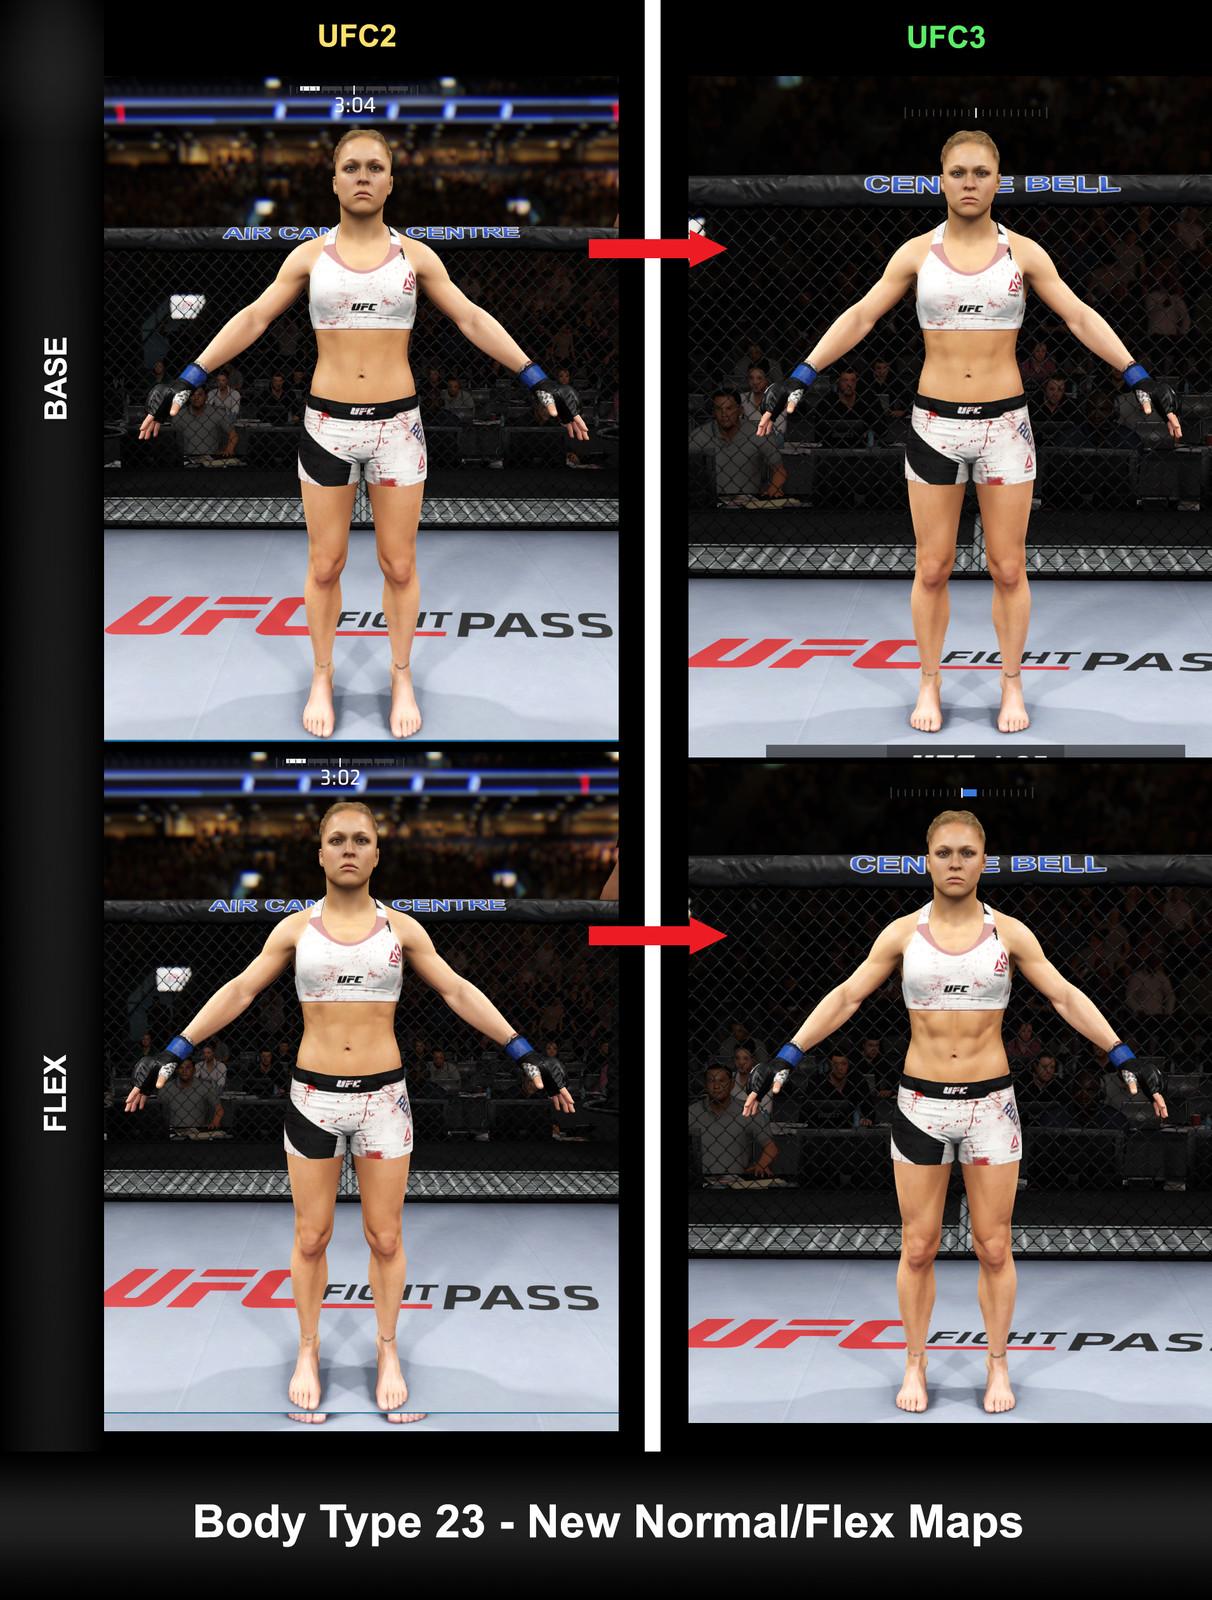 Ronda Rousey updates texture